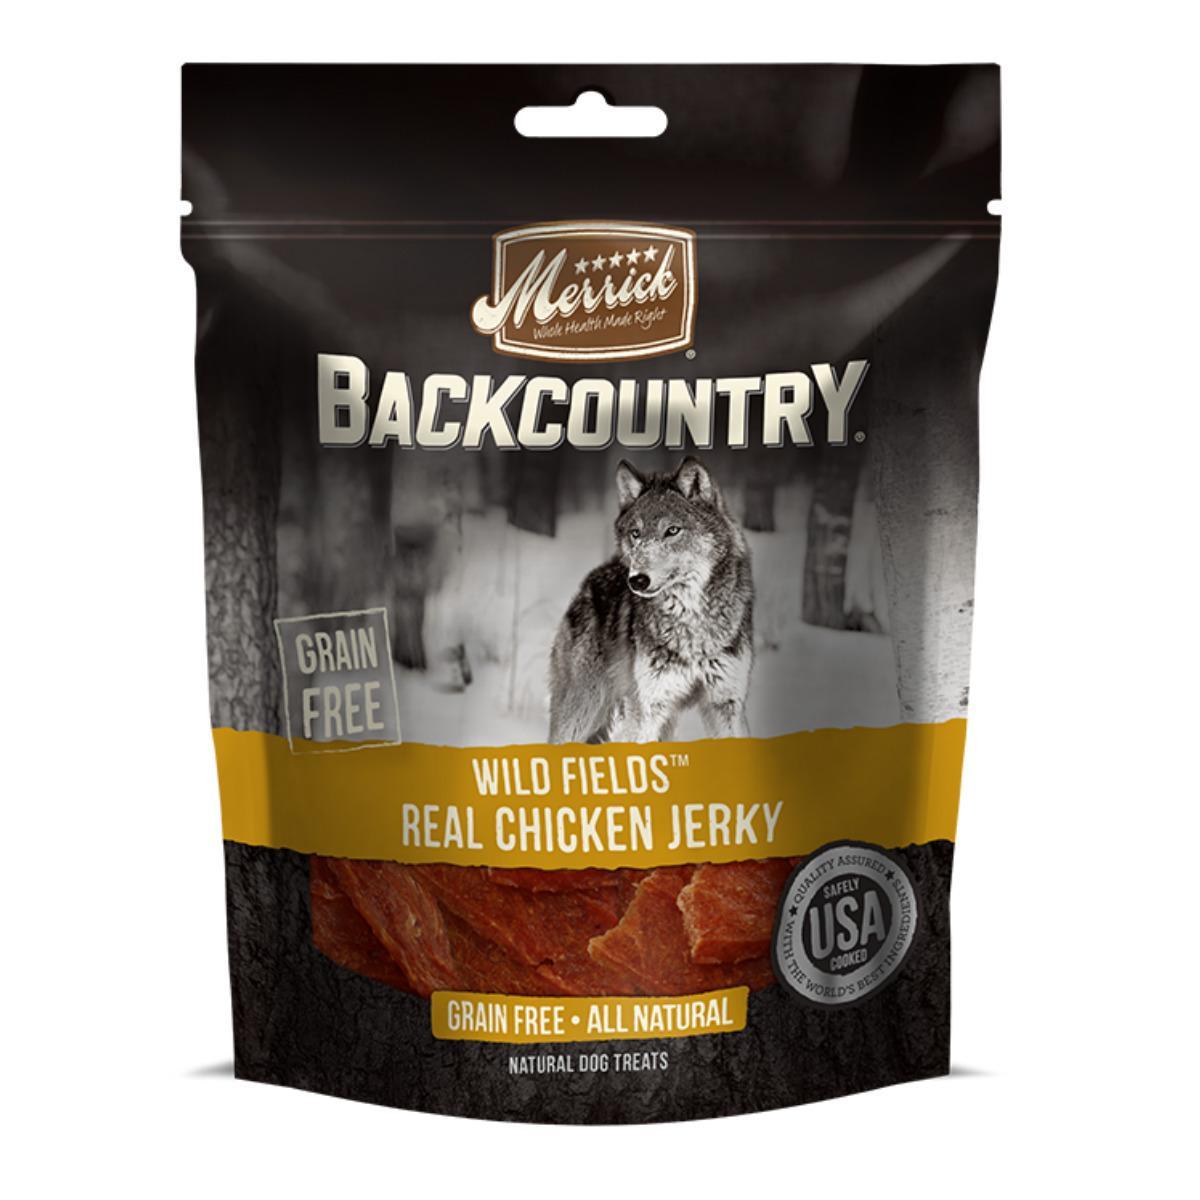 Merrick Backcountry Dog Treats - Wild Fields Real Chicken Jerky